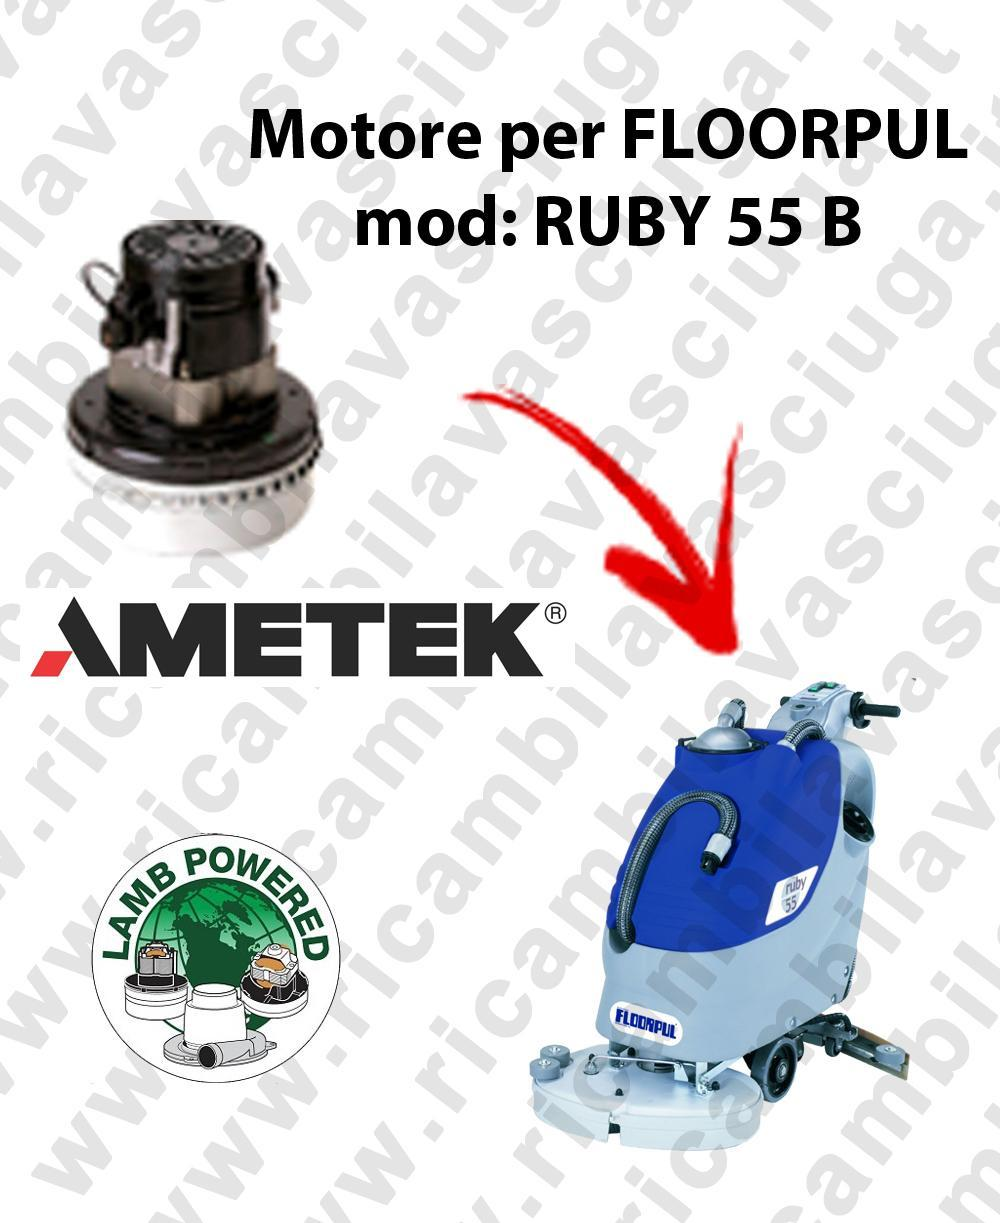 RUBY 55 B Motore de aspiración LAMB AMETEK para fregadora FLOORPUL